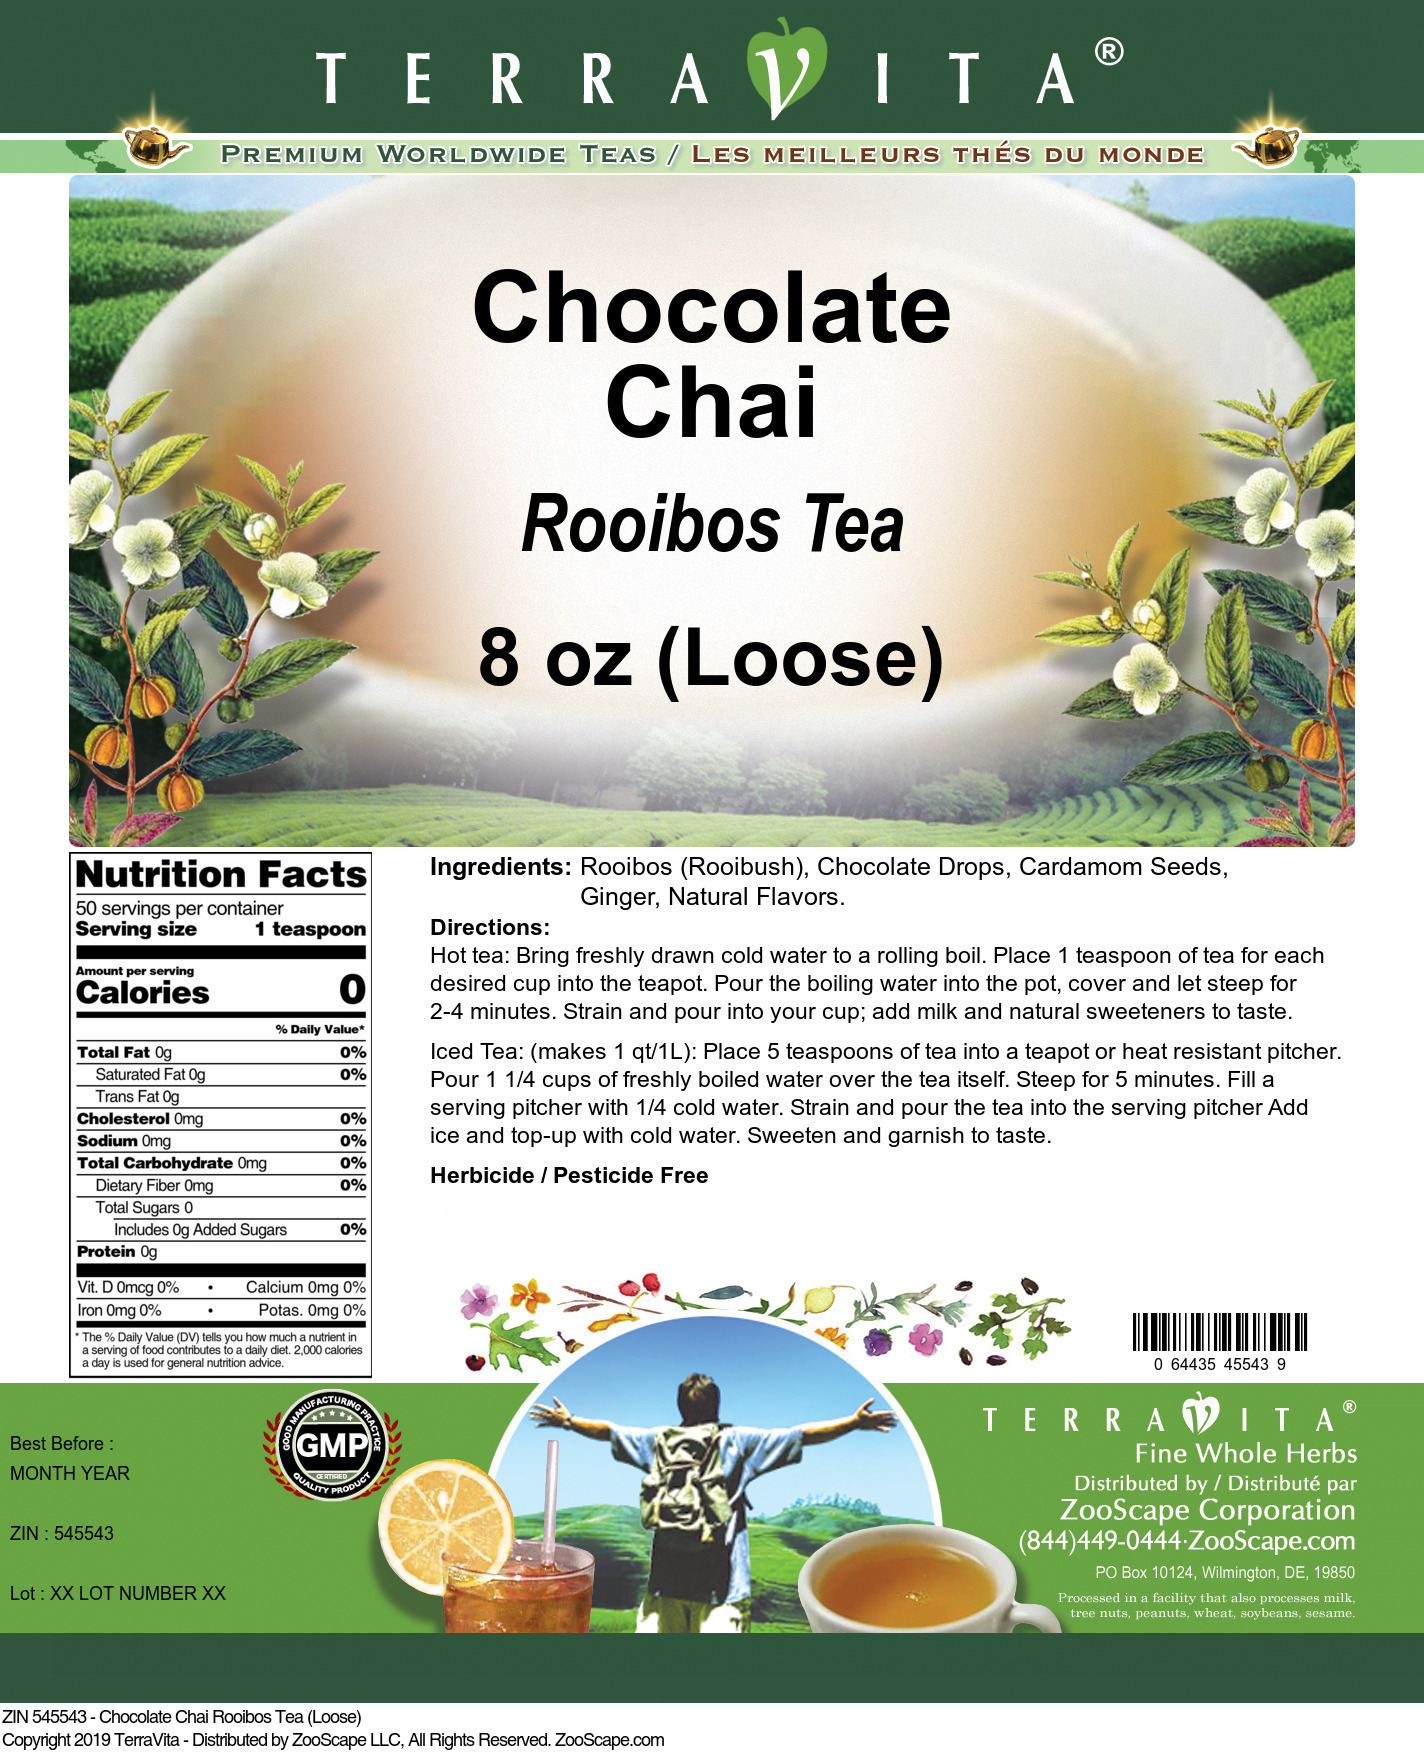 Chocolate Chai Rooibos Tea (Loose)